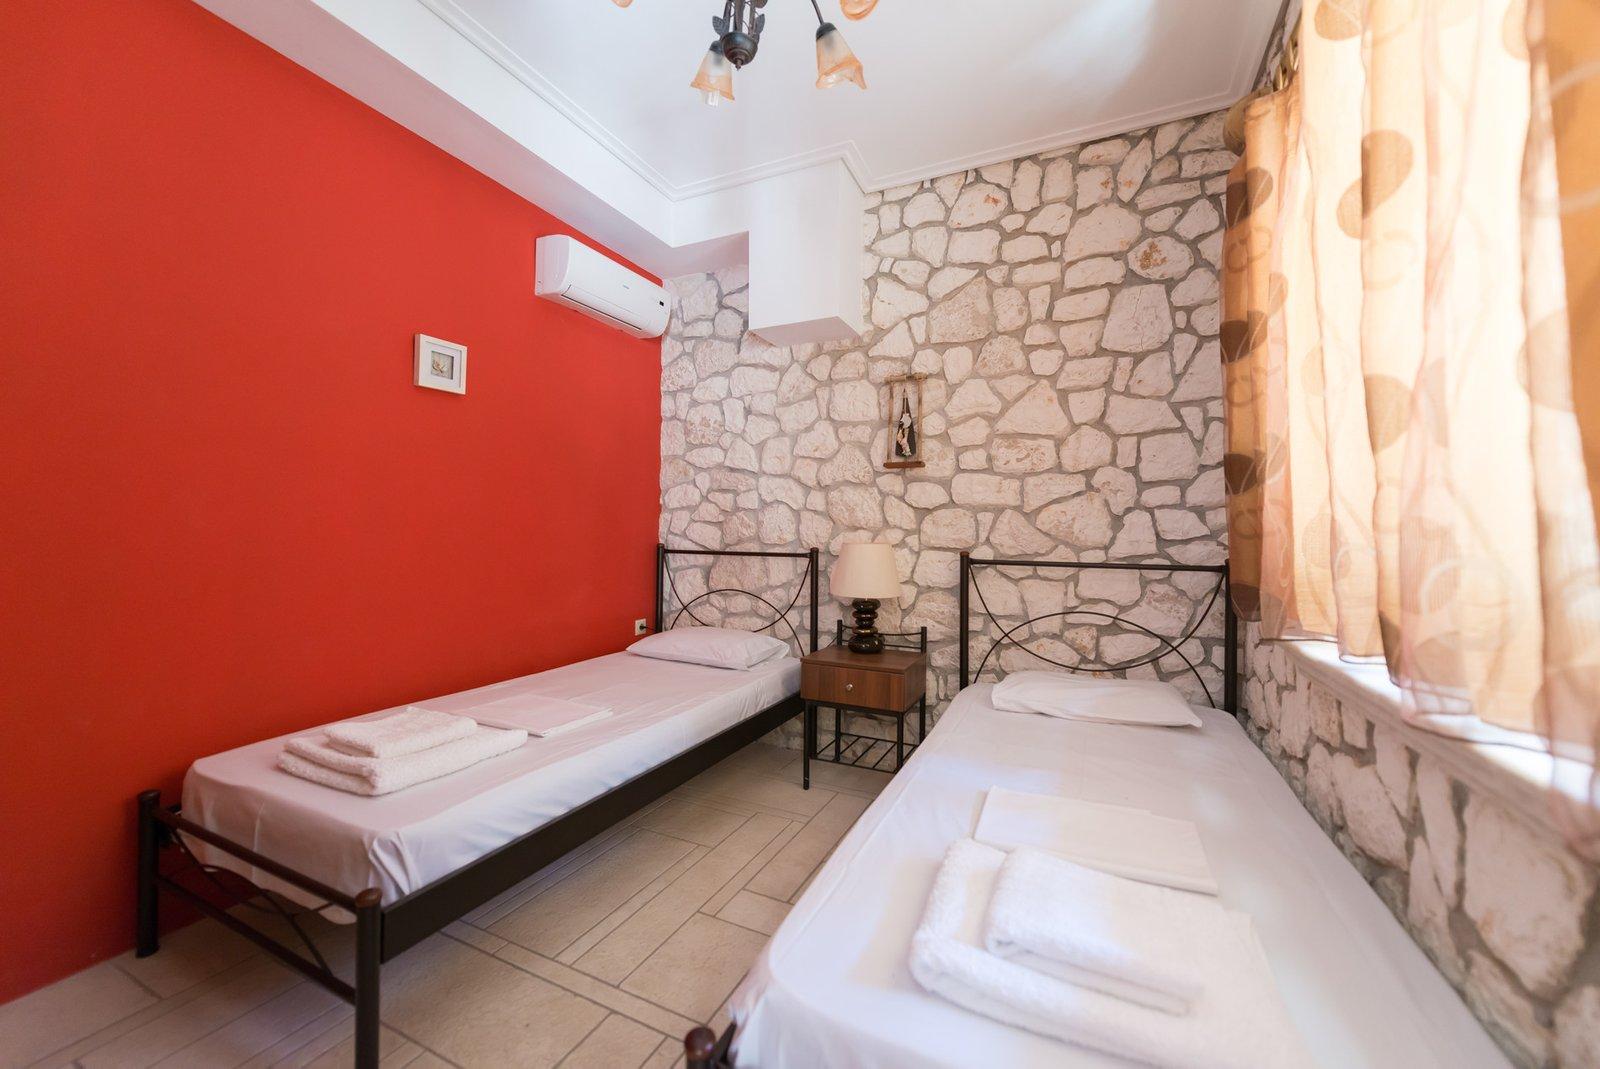 Tilemachos single bedroom